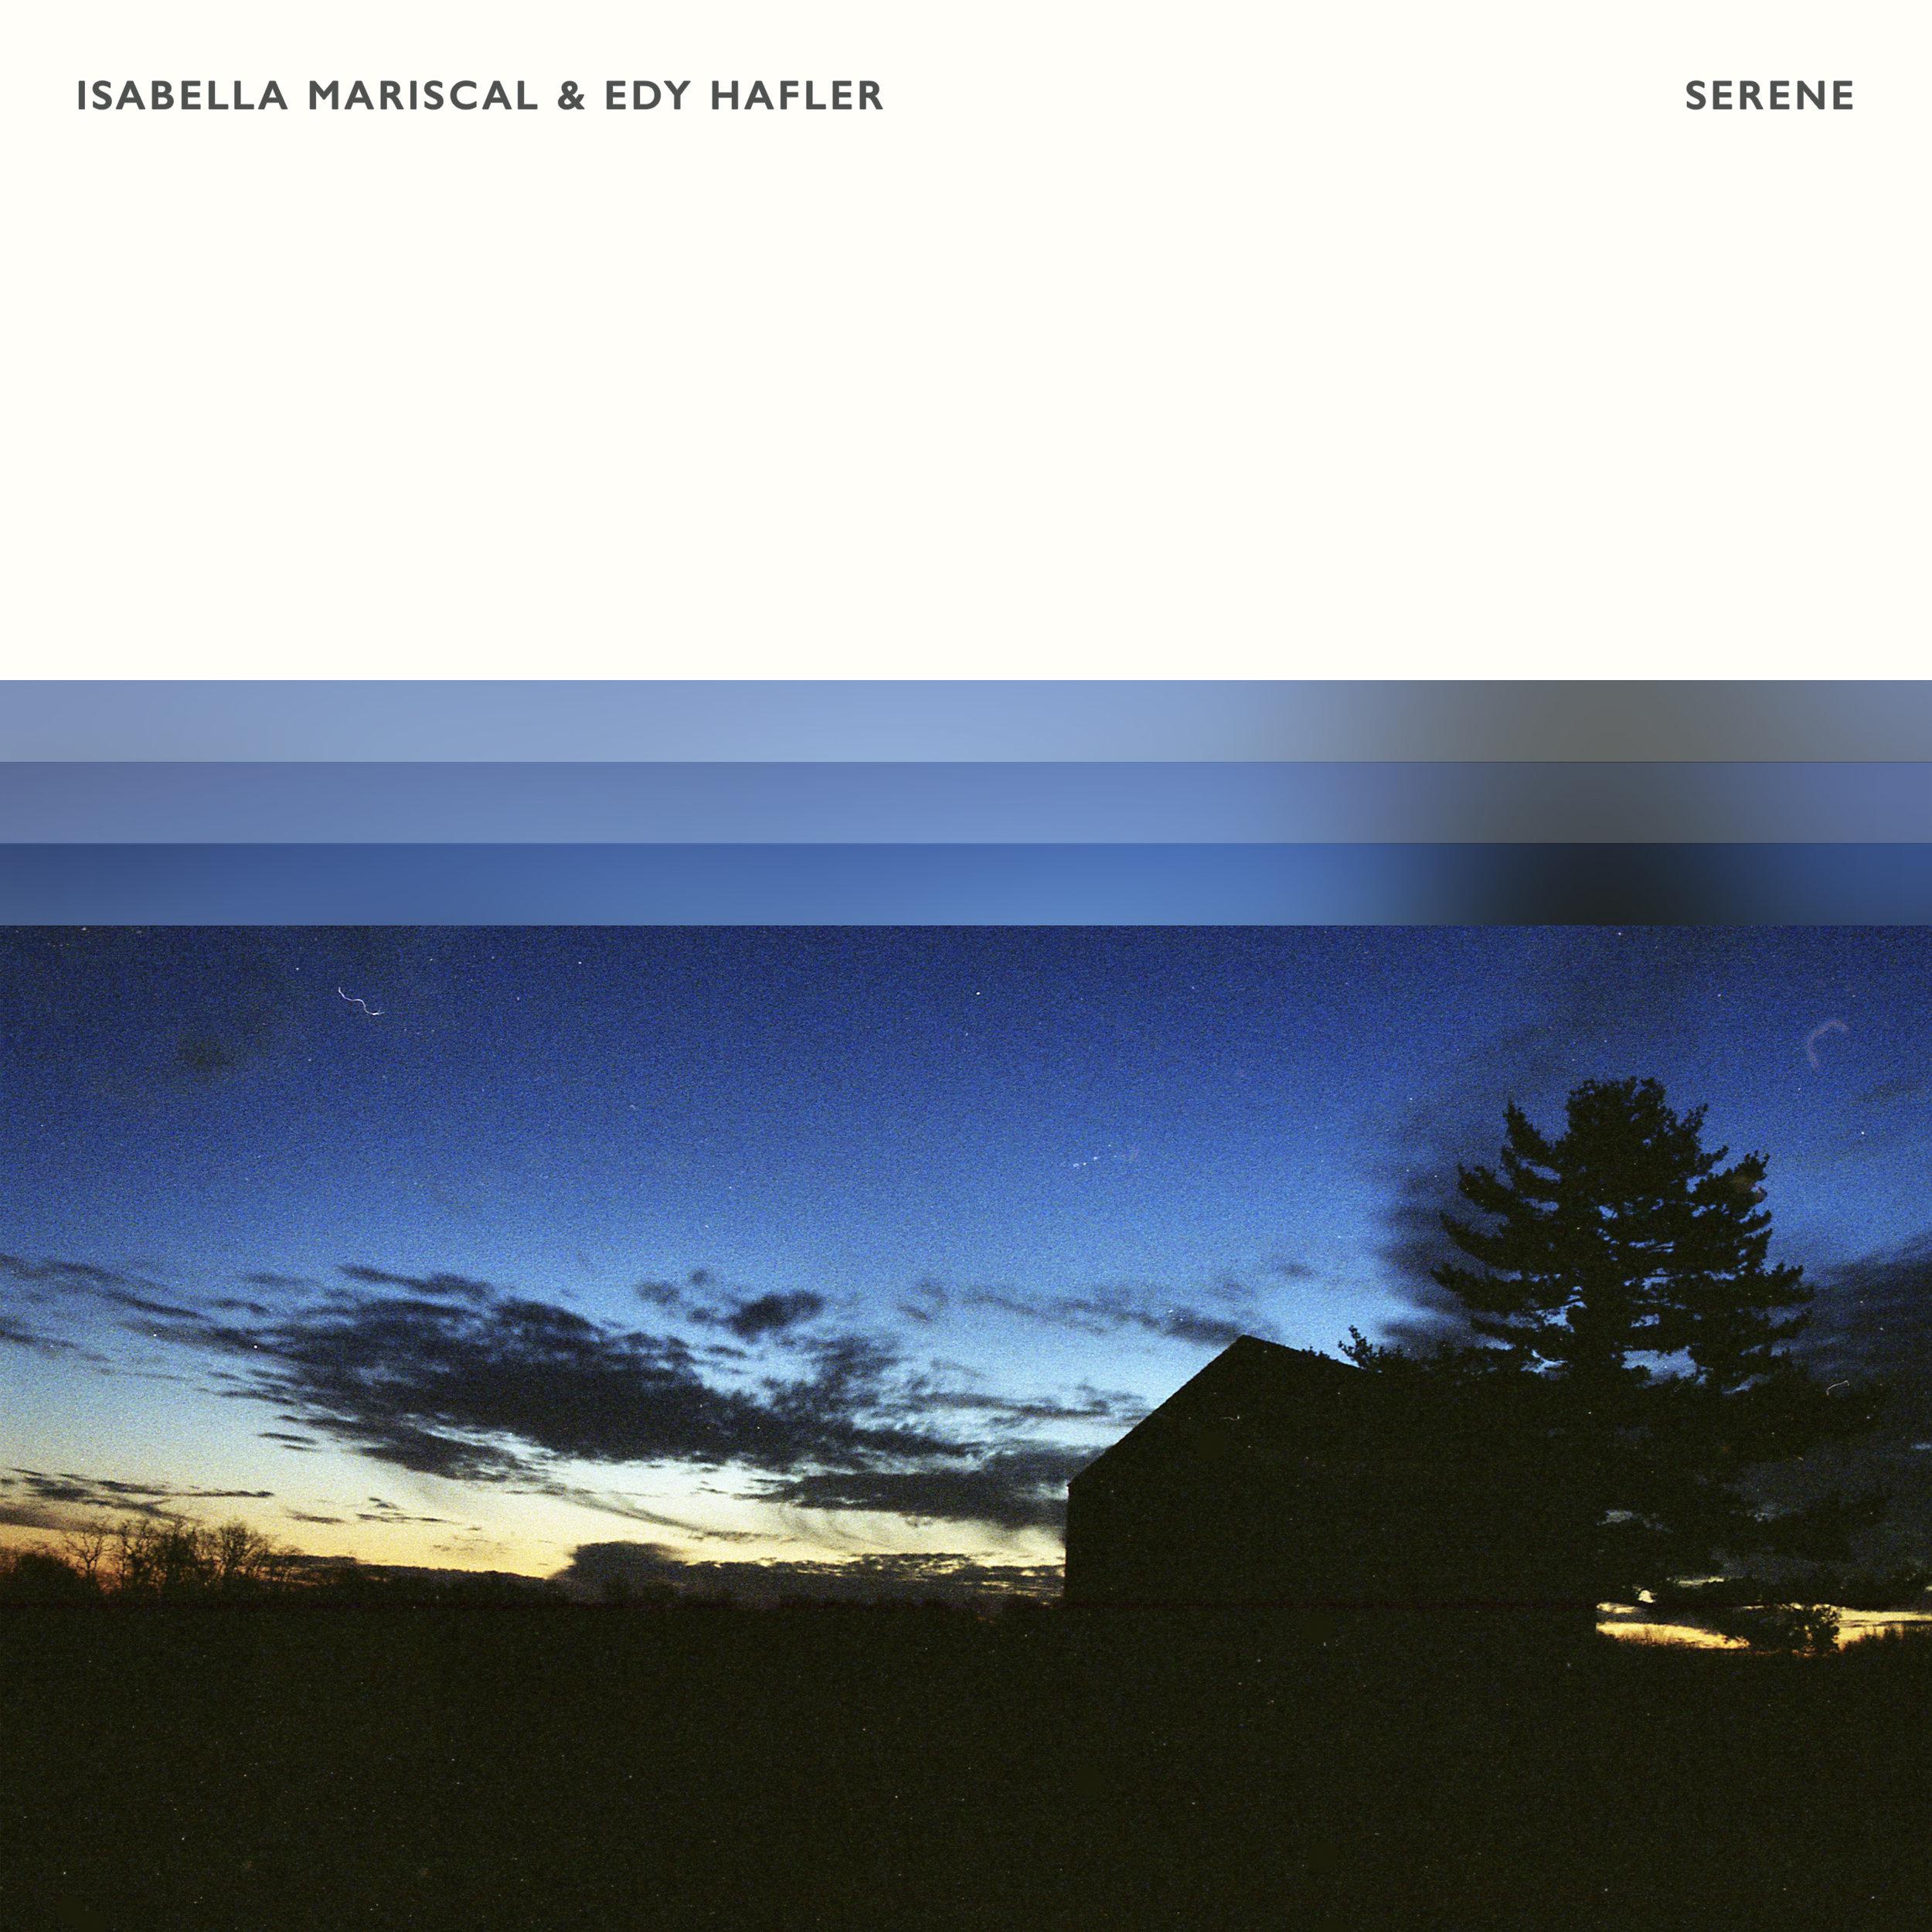 Isabella Mariscal & Edy Hafler - Serene